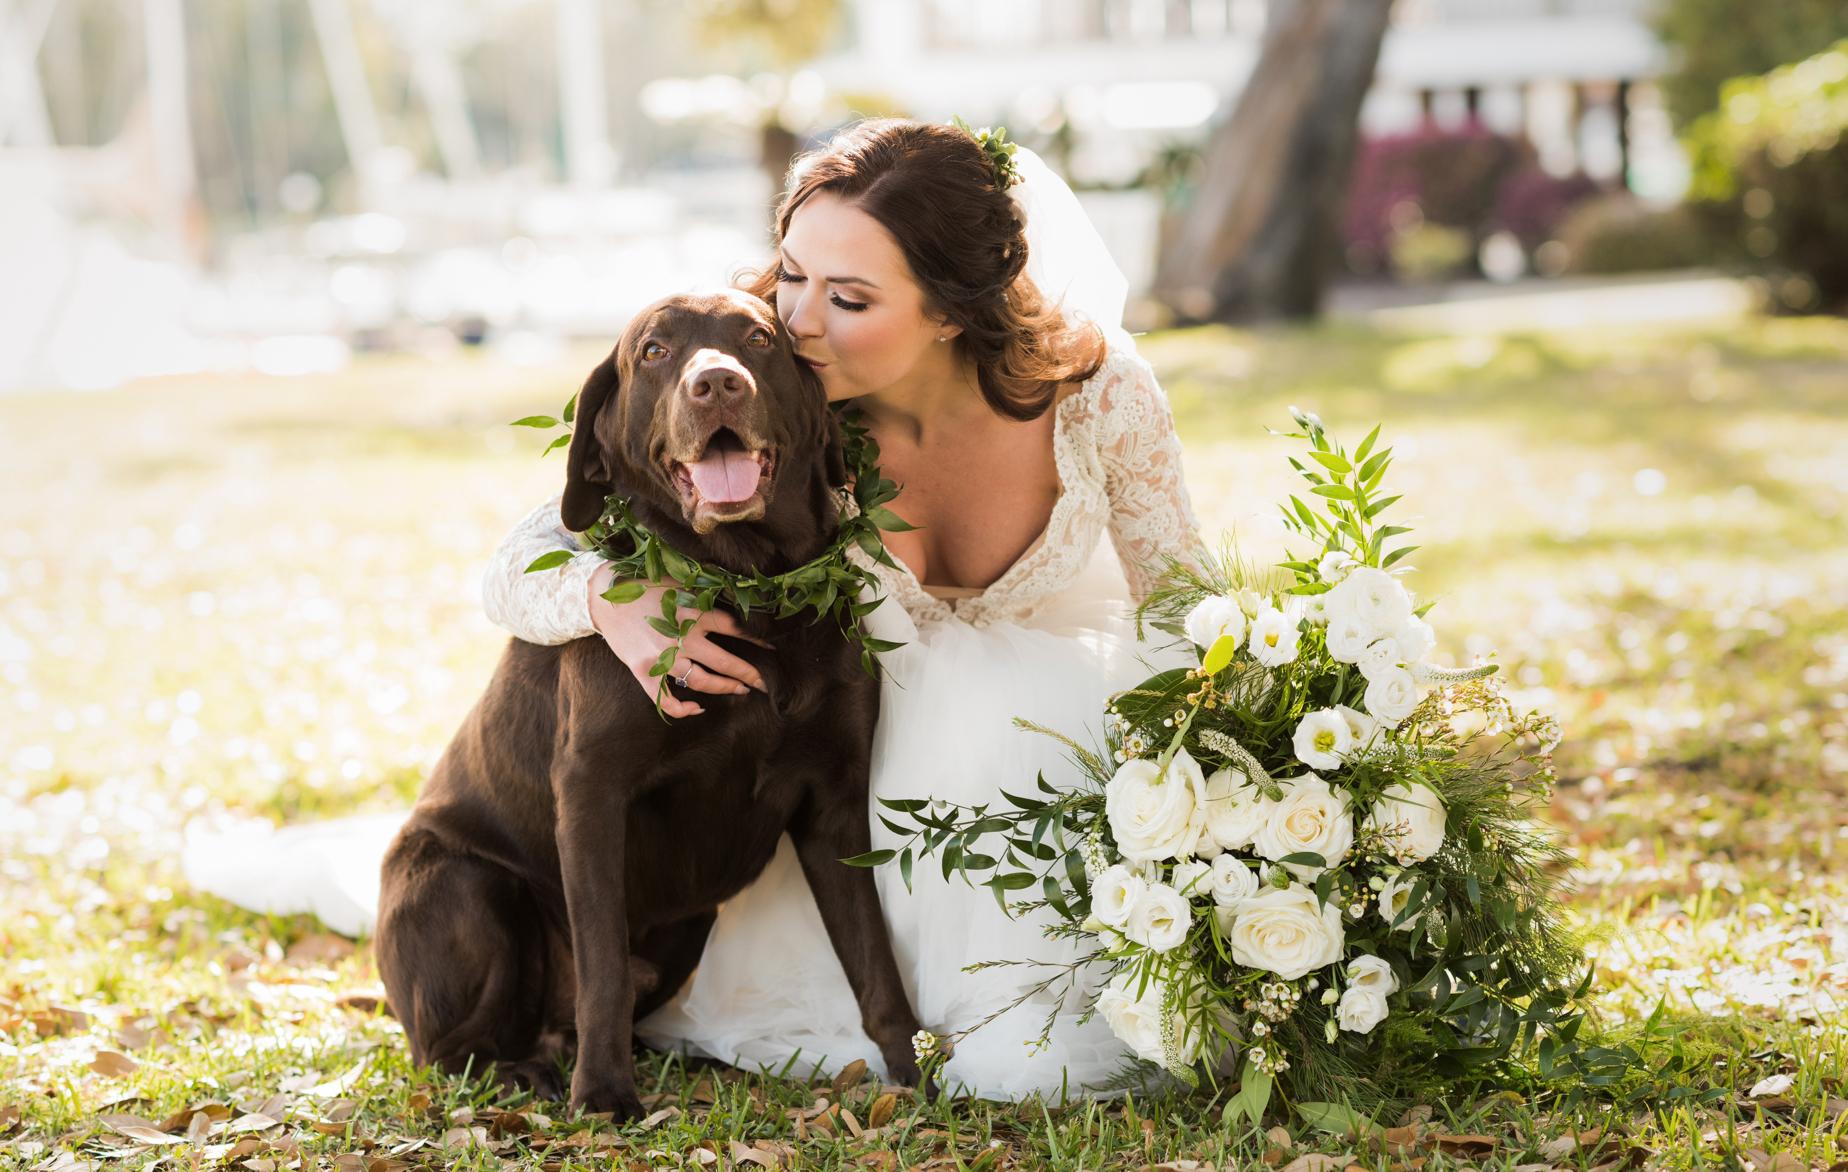 Best man - Aislinn Kate Wedding Photography - Pensacola, Florida